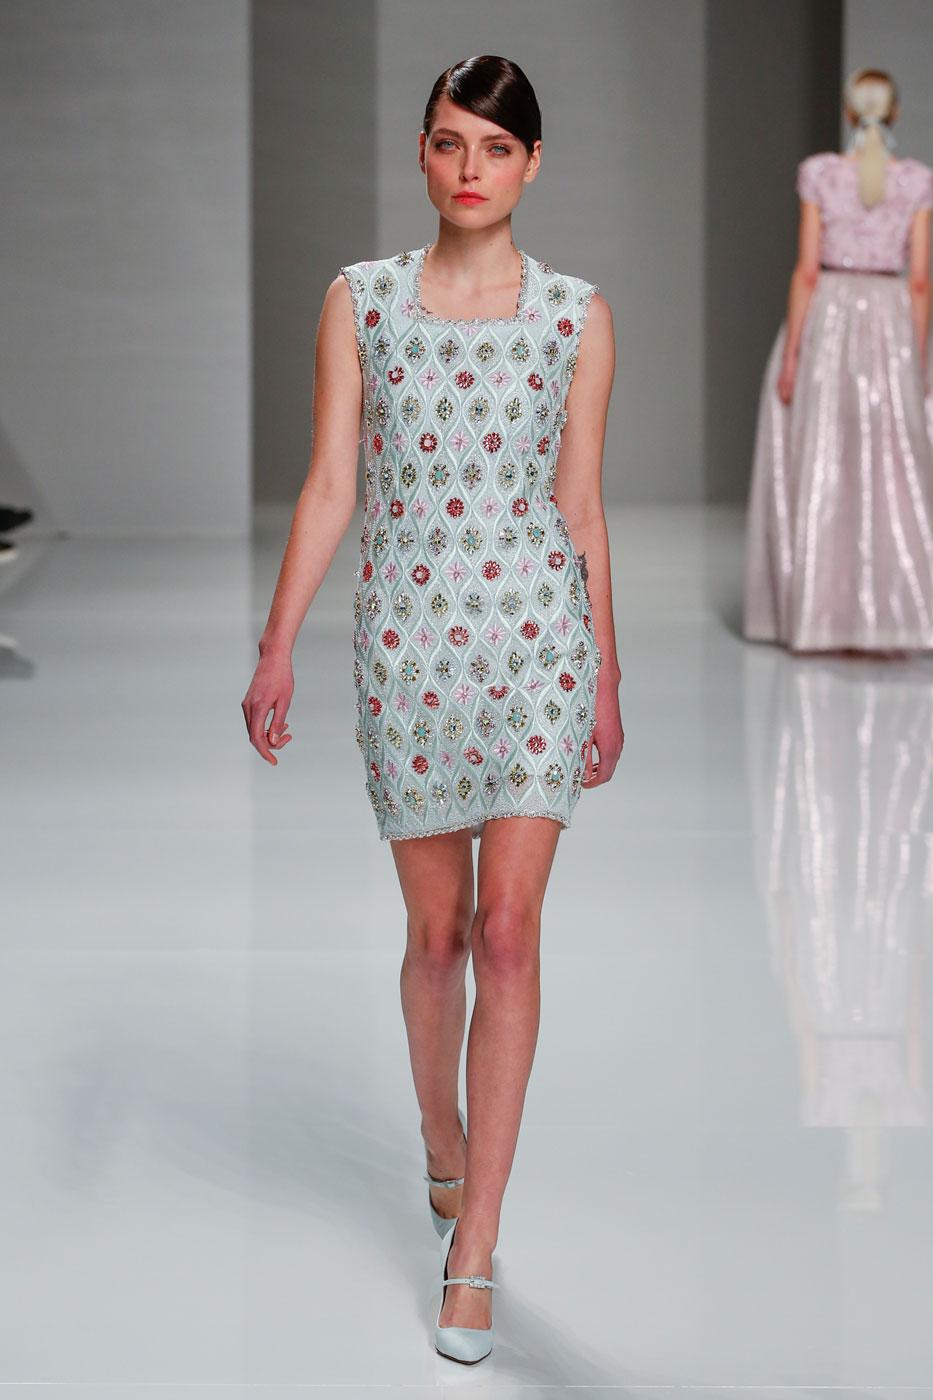 Georges-Hobeika-fashion-runway-show-haute-couture-paris-spring-2015-the-impression-15